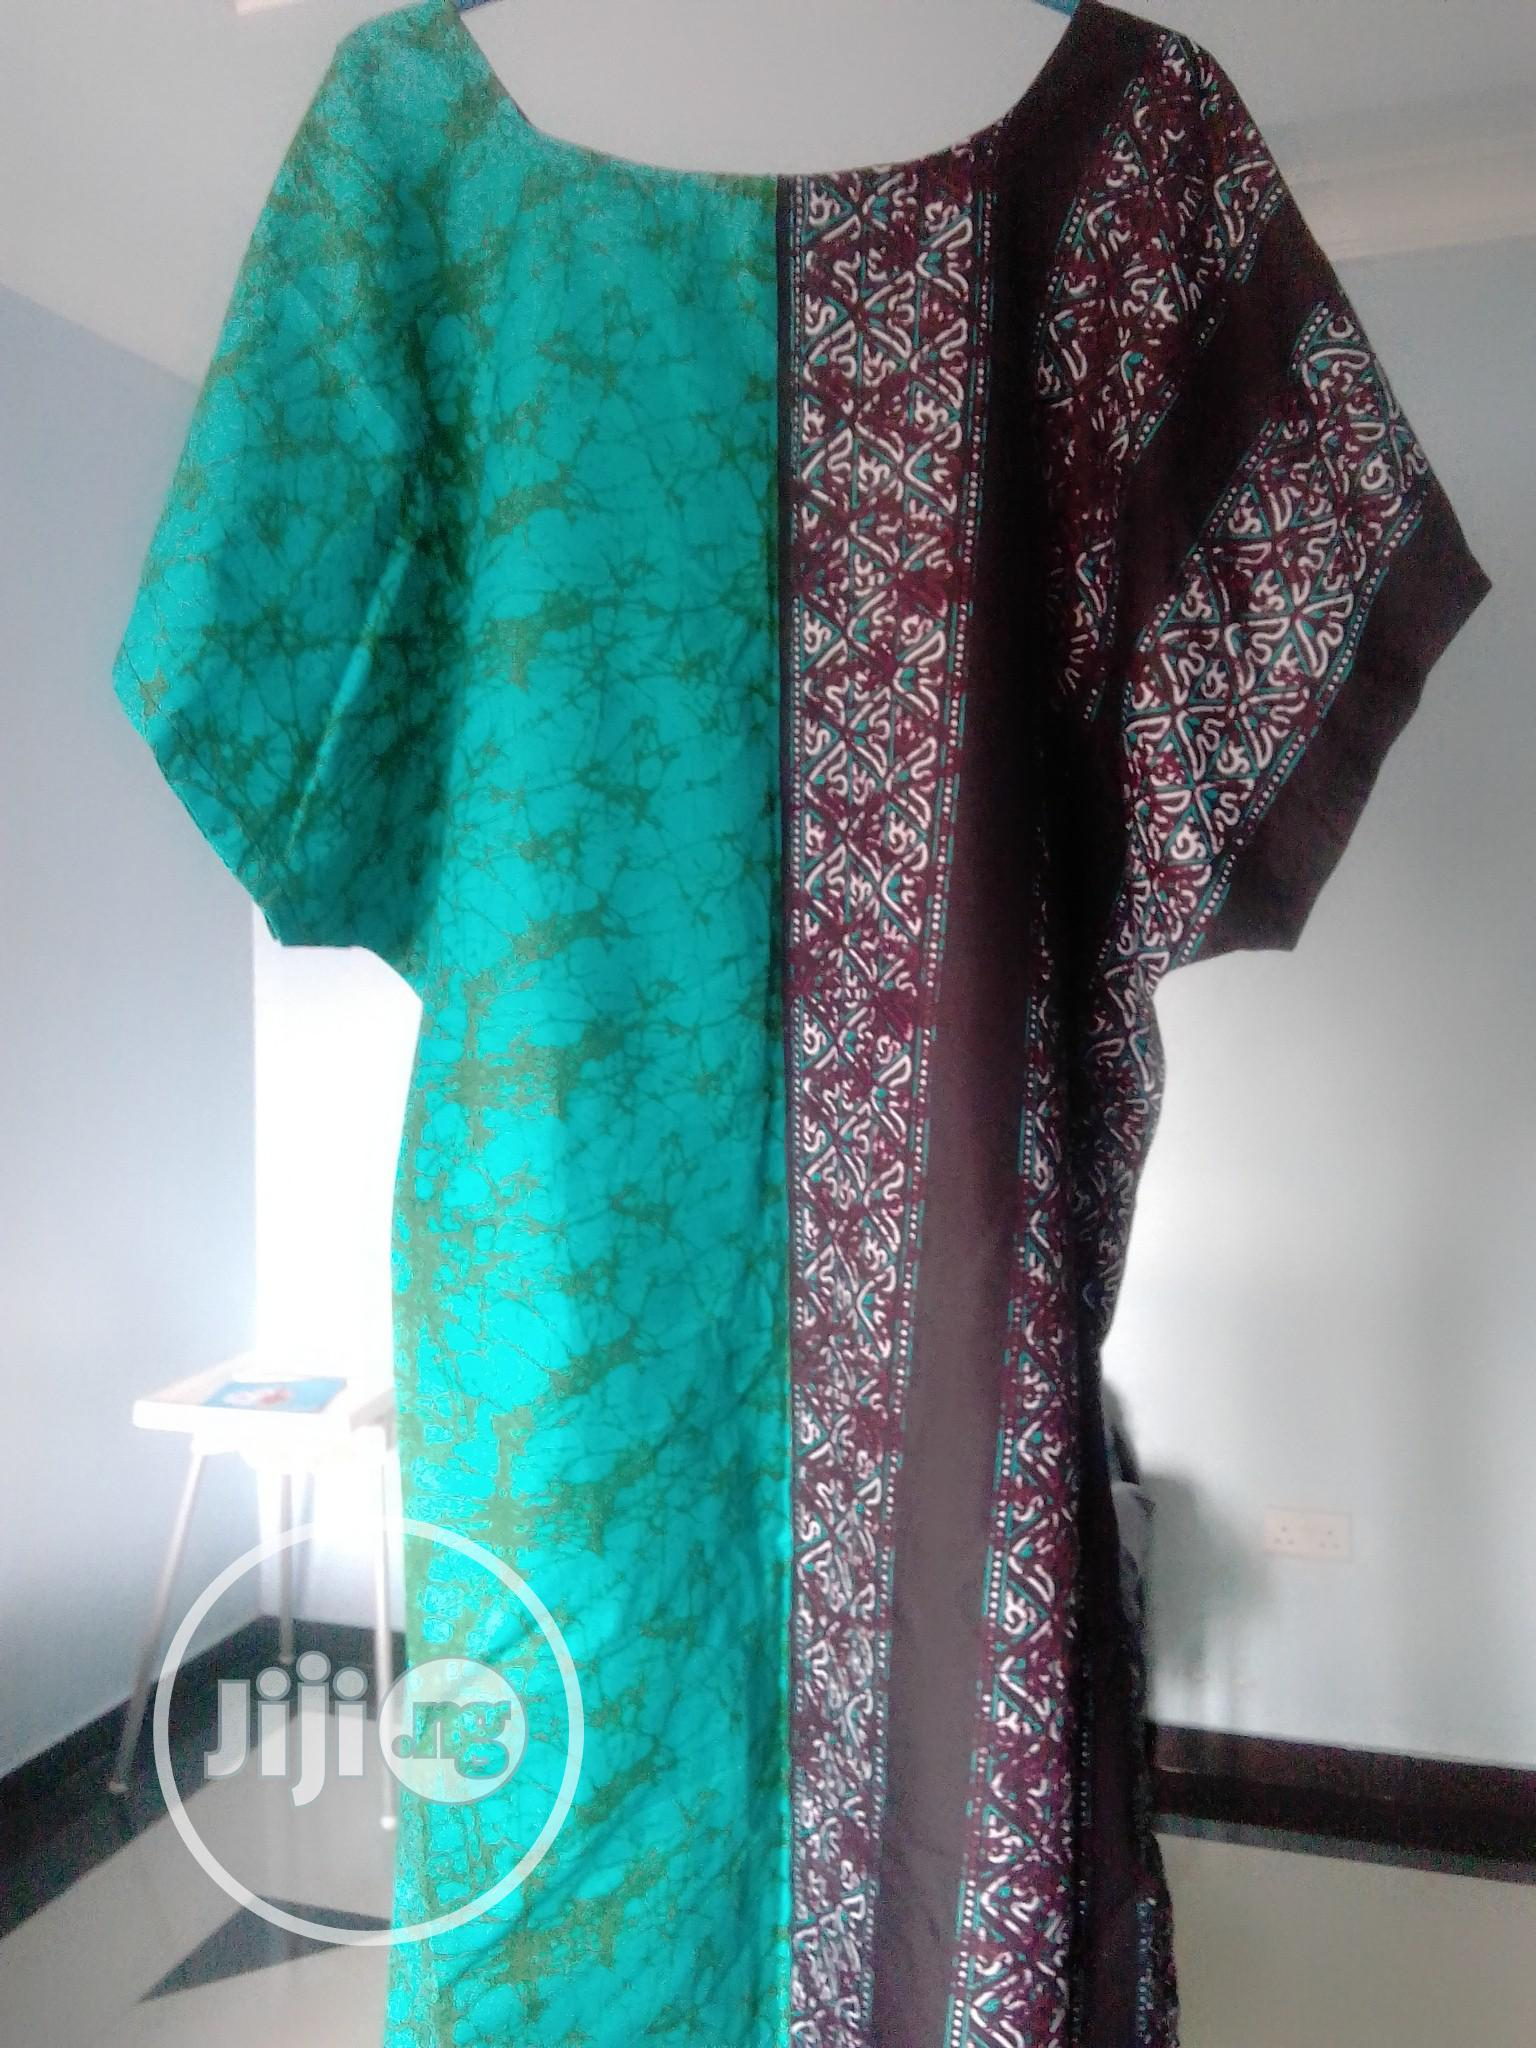 Mix match clothes